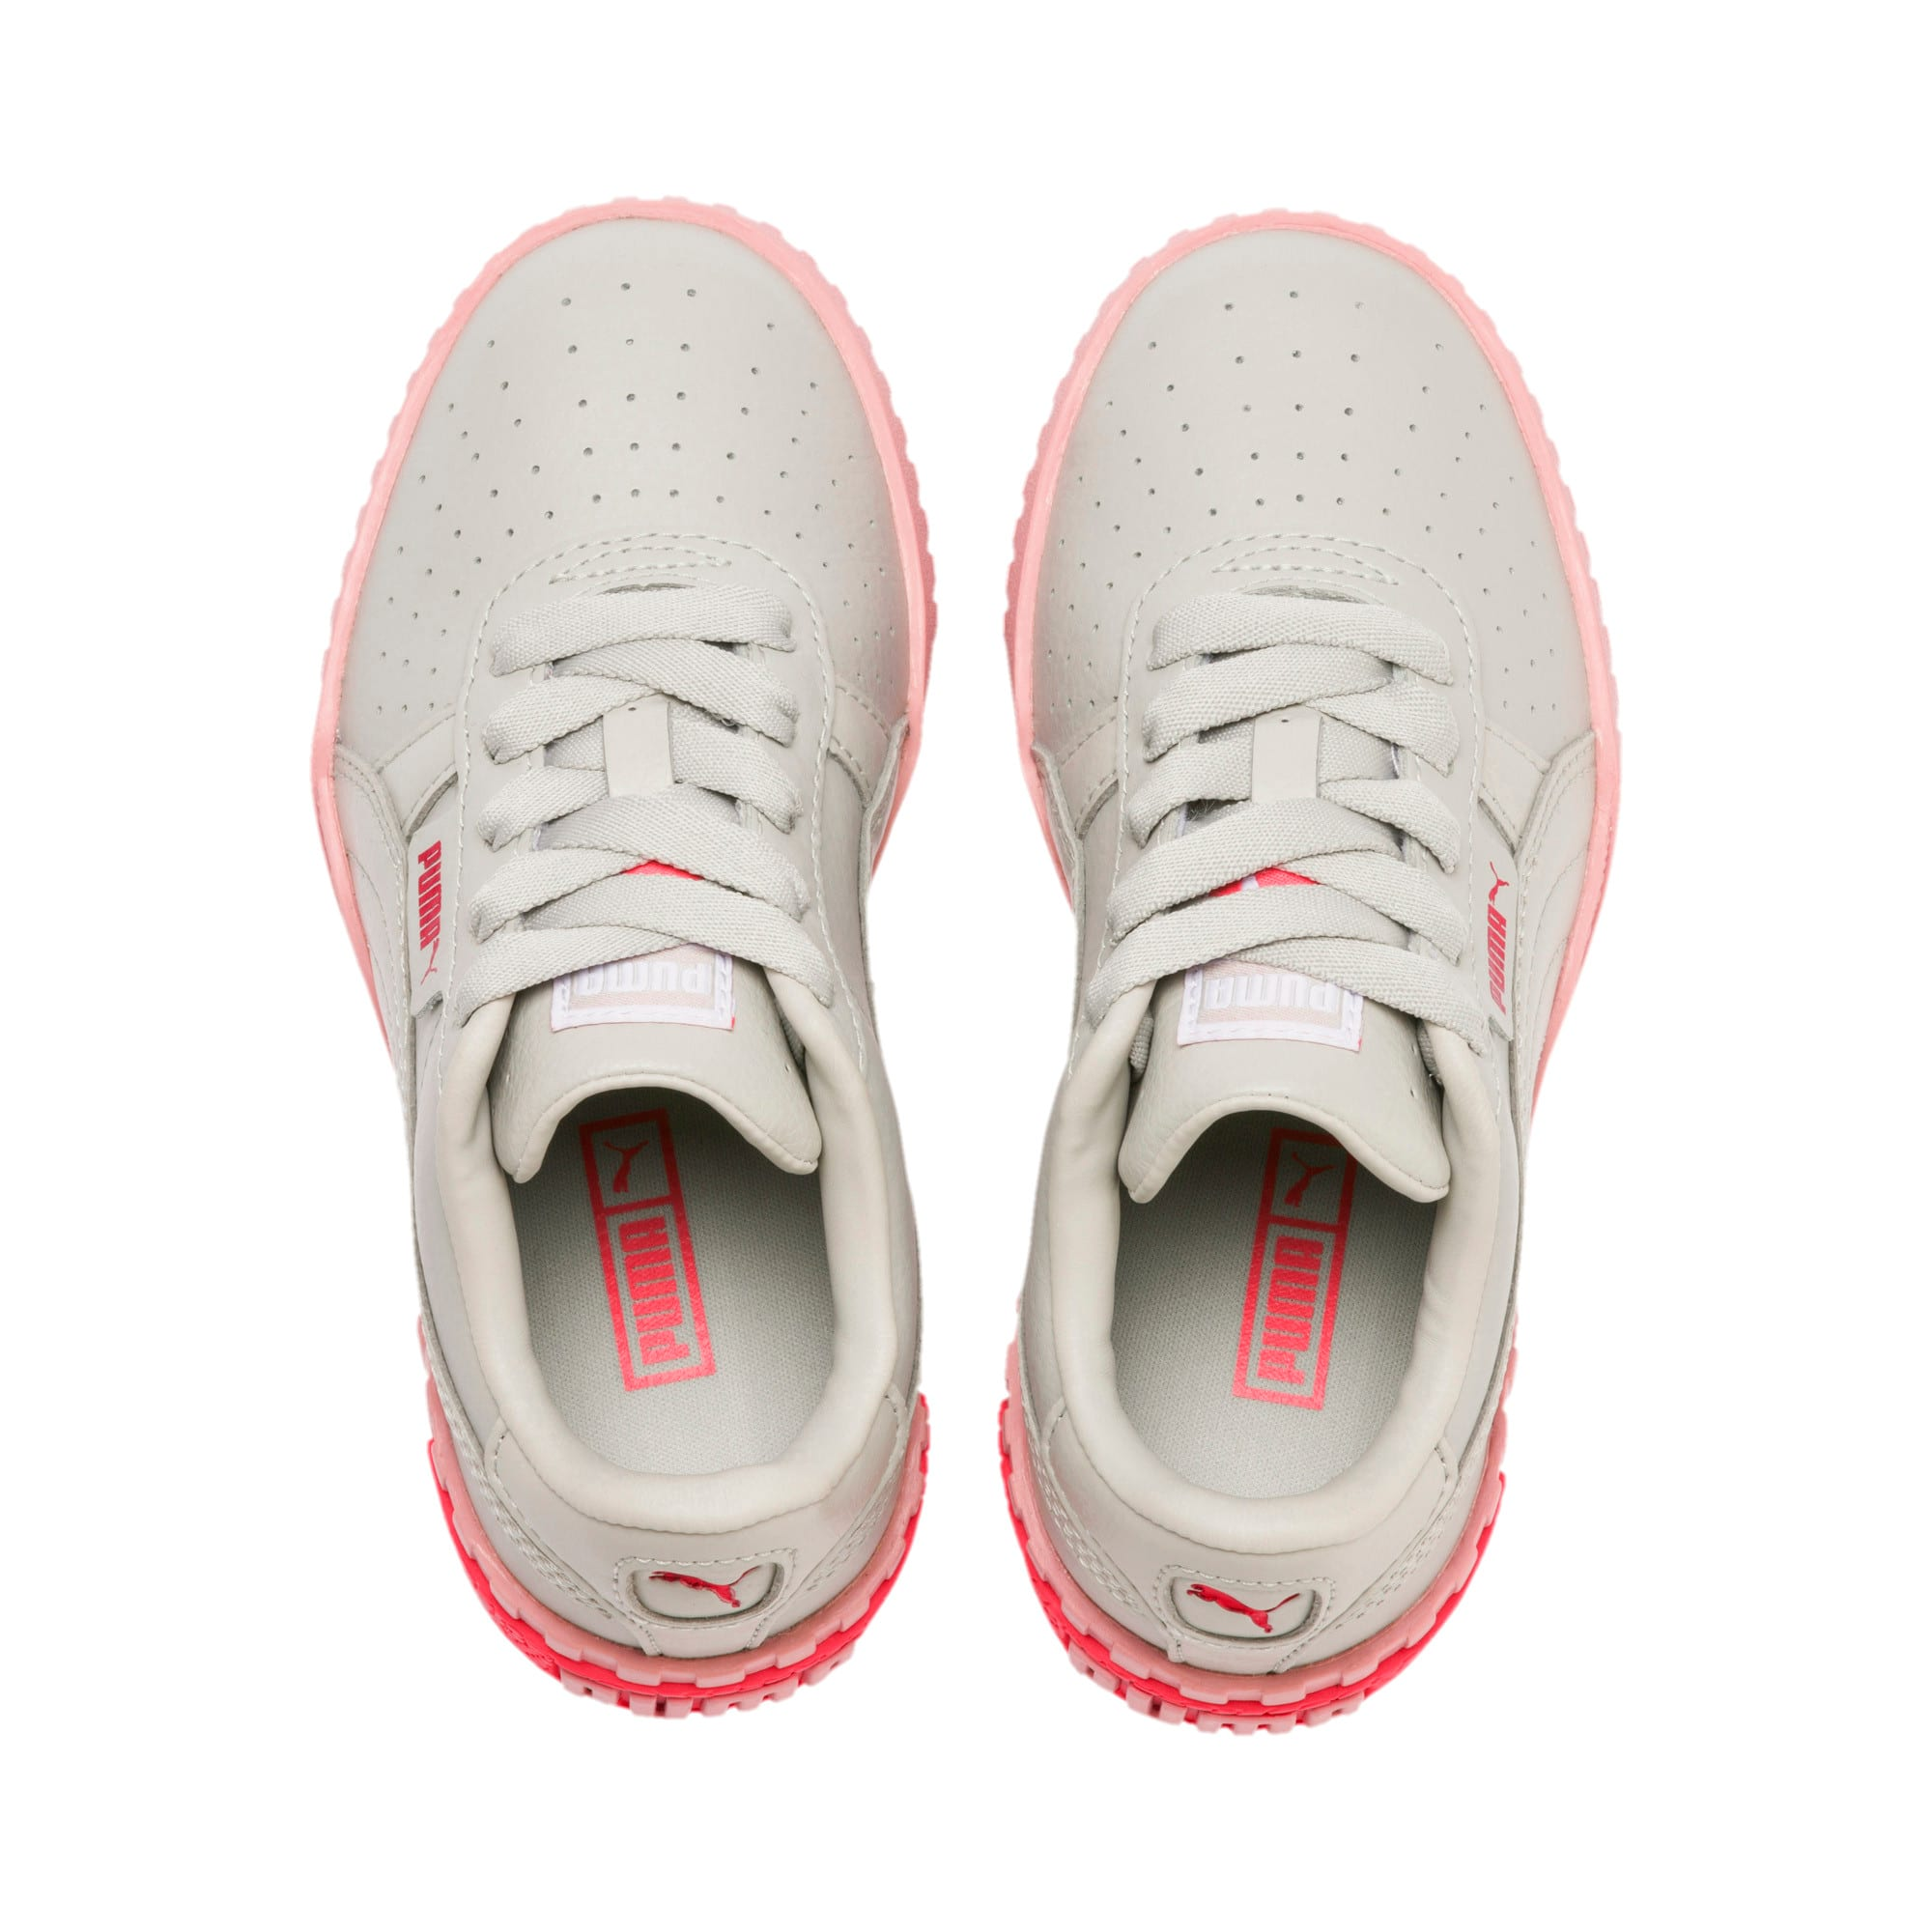 Thumbnail 6 of Cali Kids' Mädchen Sneaker, Gray Violet-Calypso Coral, medium